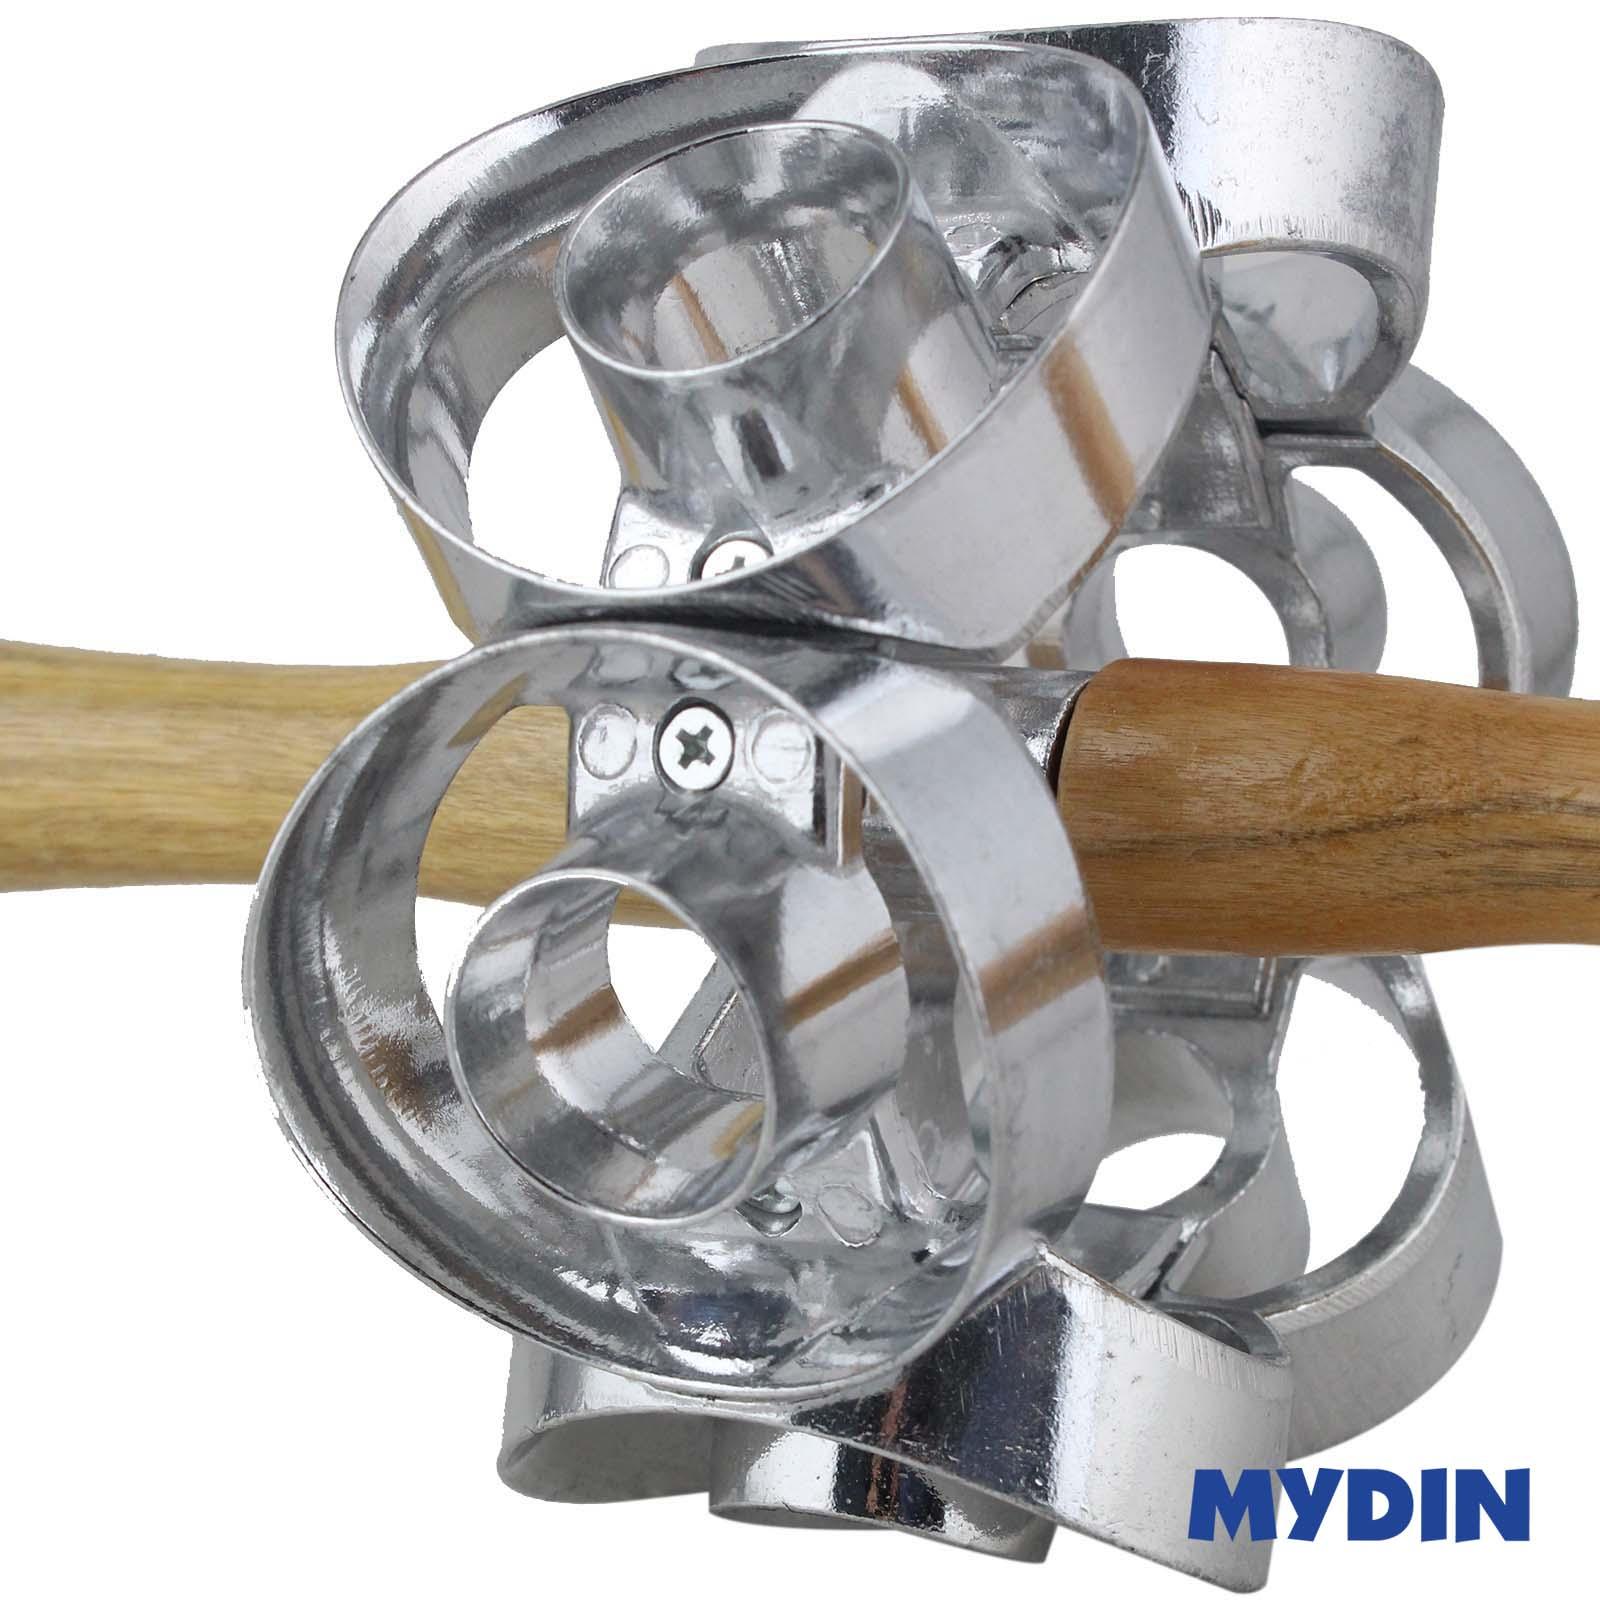 Donut Cutter 6-Cut Per Revolution (RYJS1700-040)